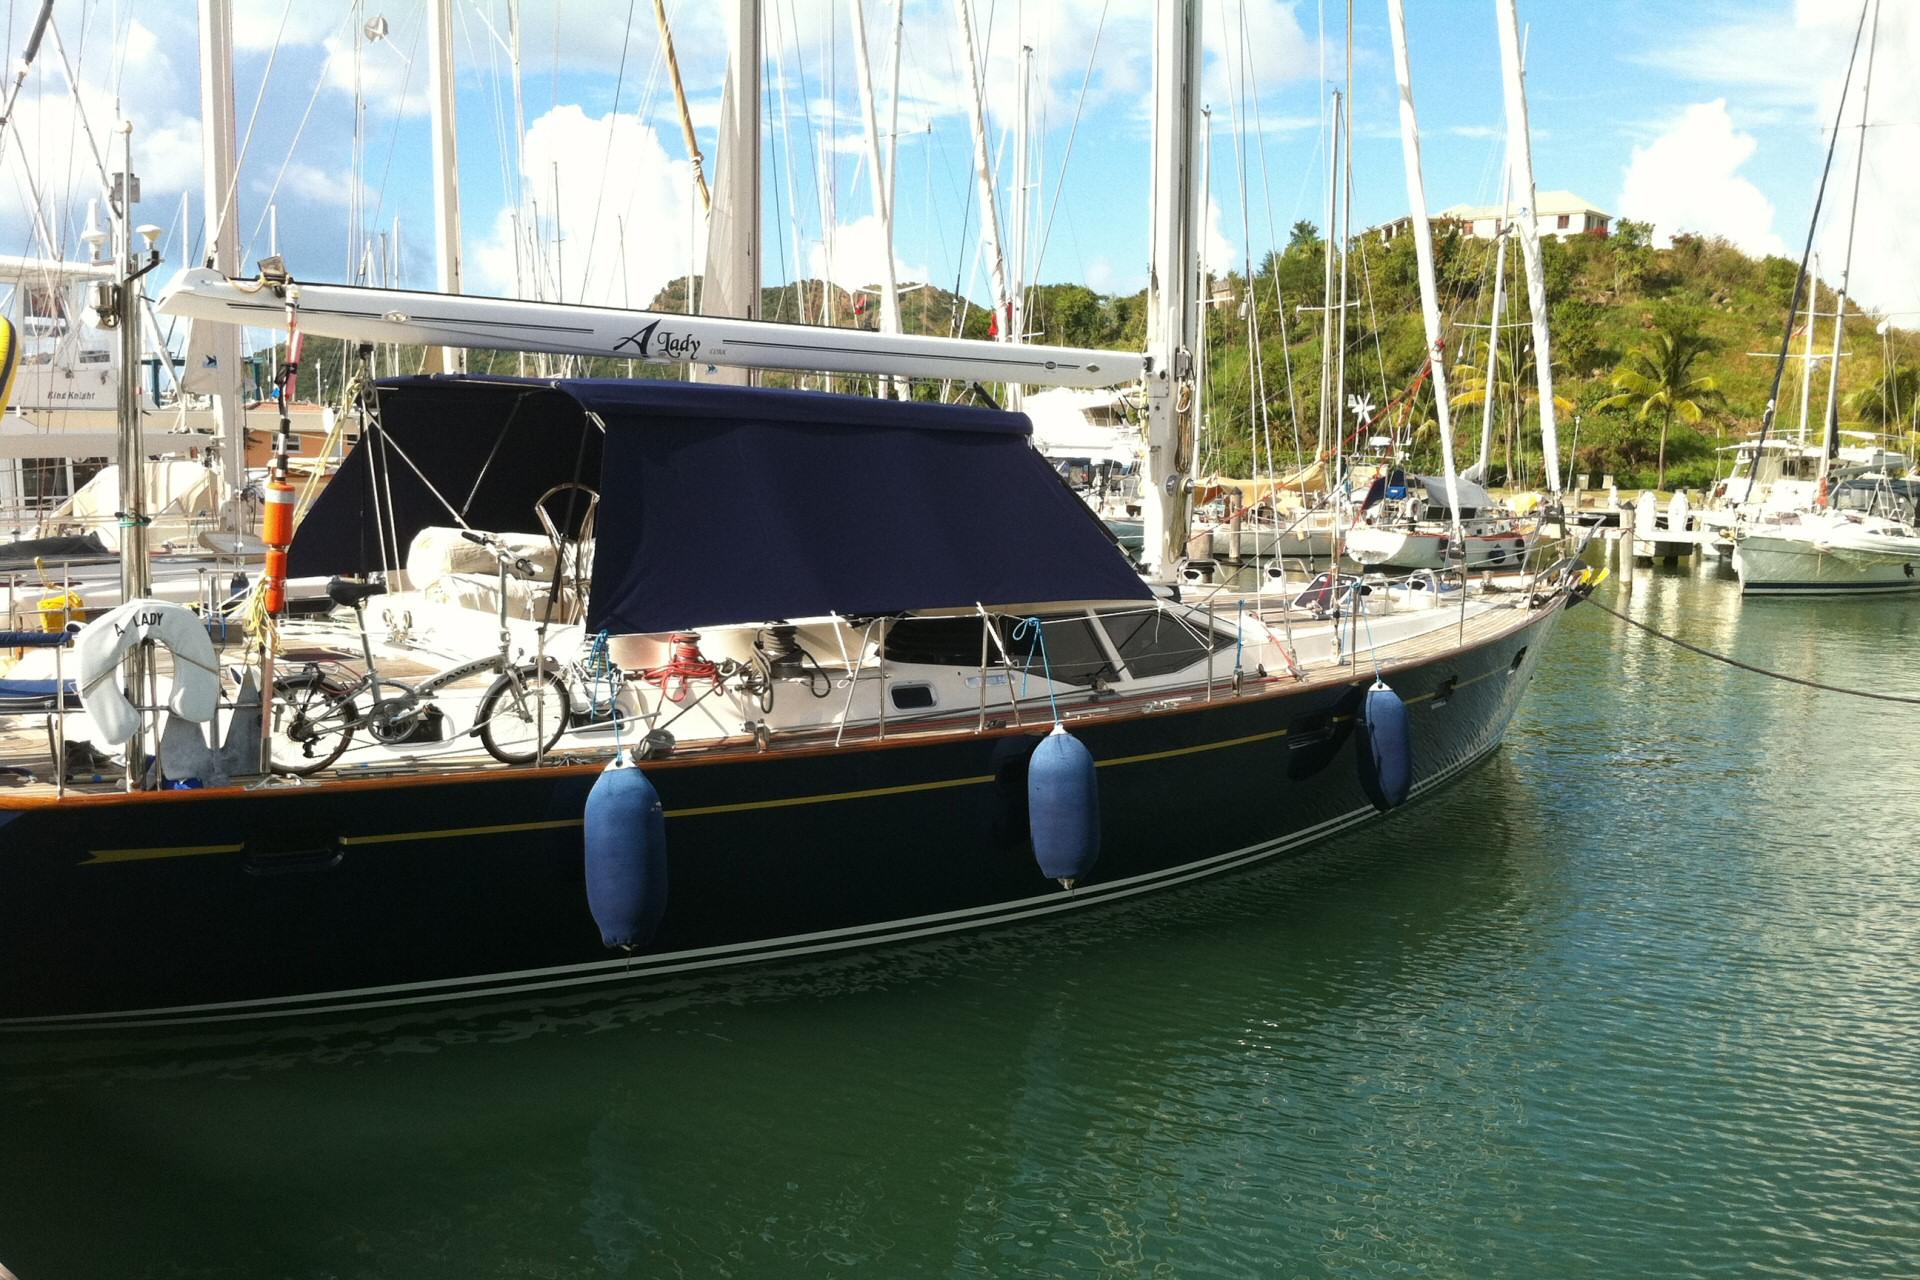 A & F Sails - Sail Repairs & More